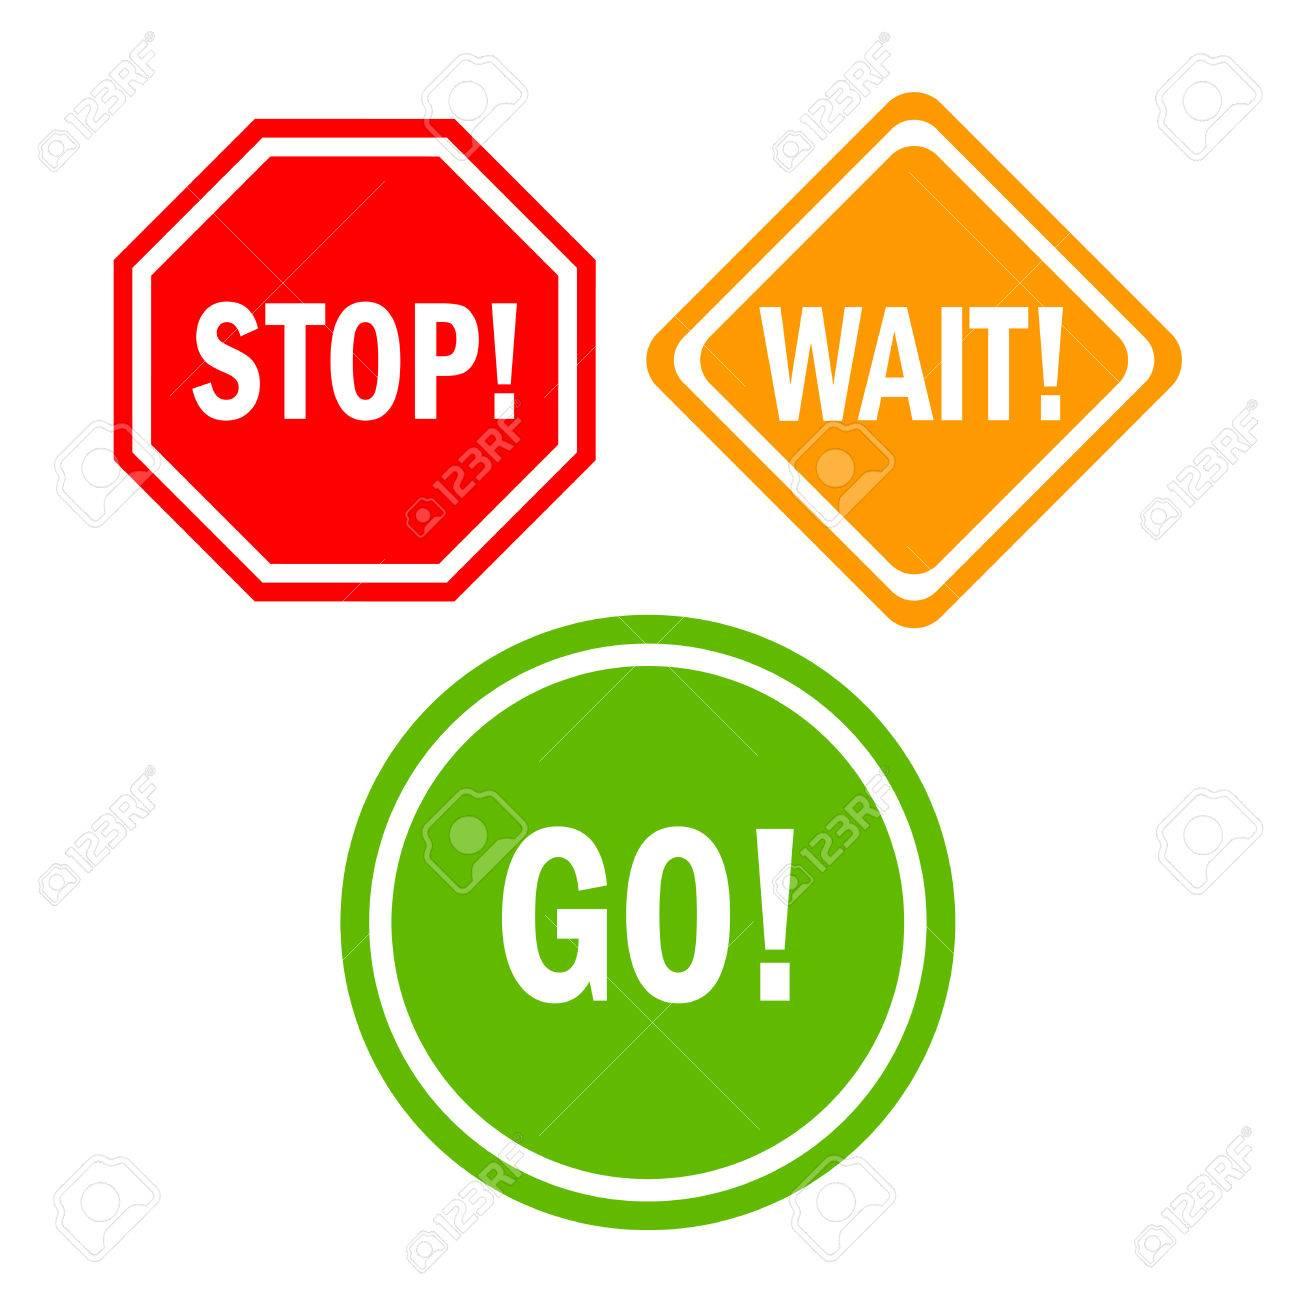 Stop wait go signs Stock Vector - 28904871